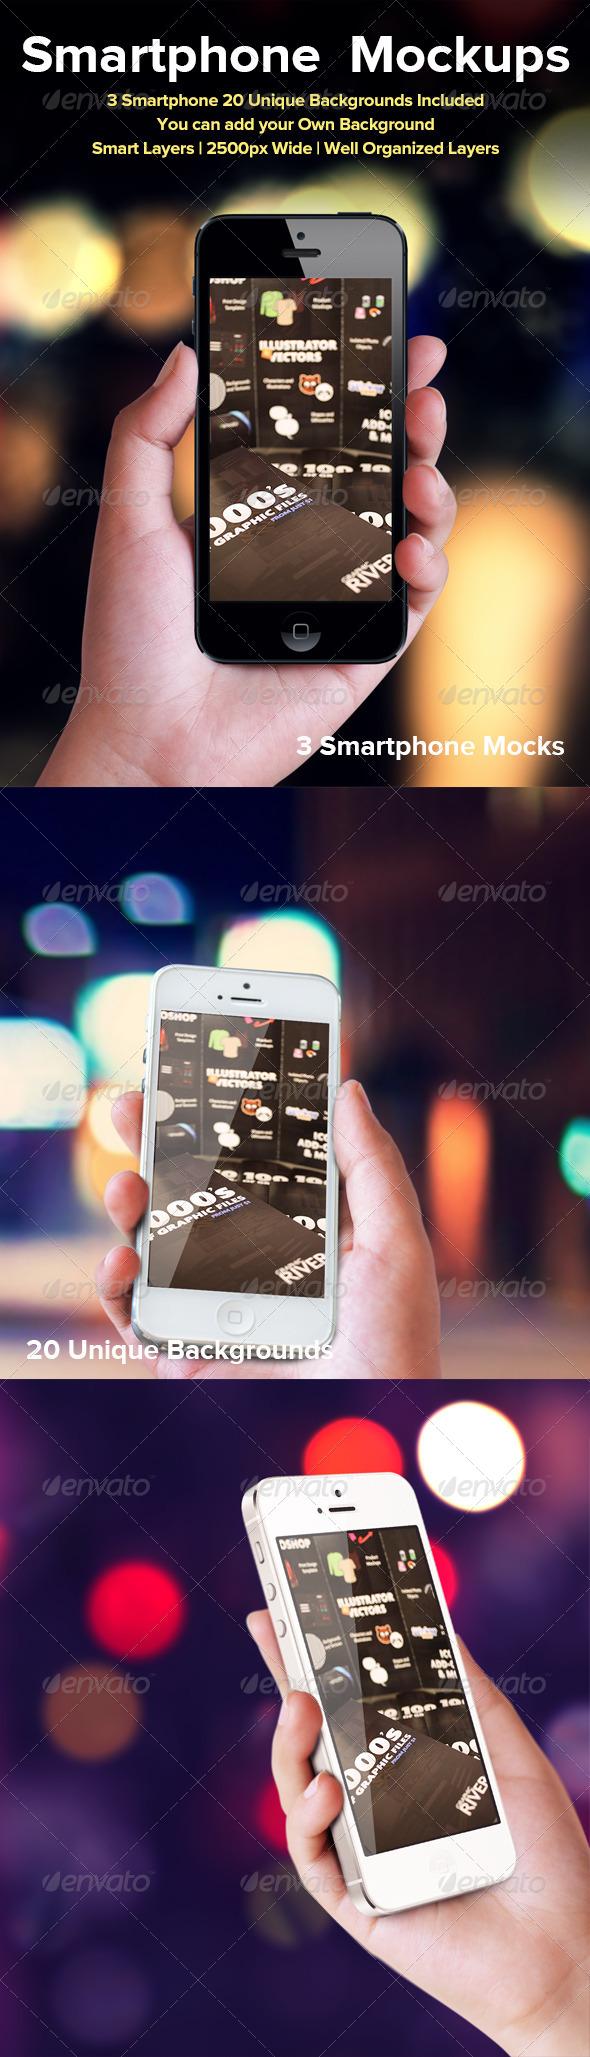 Smartphone Mockup - Mobile Displays